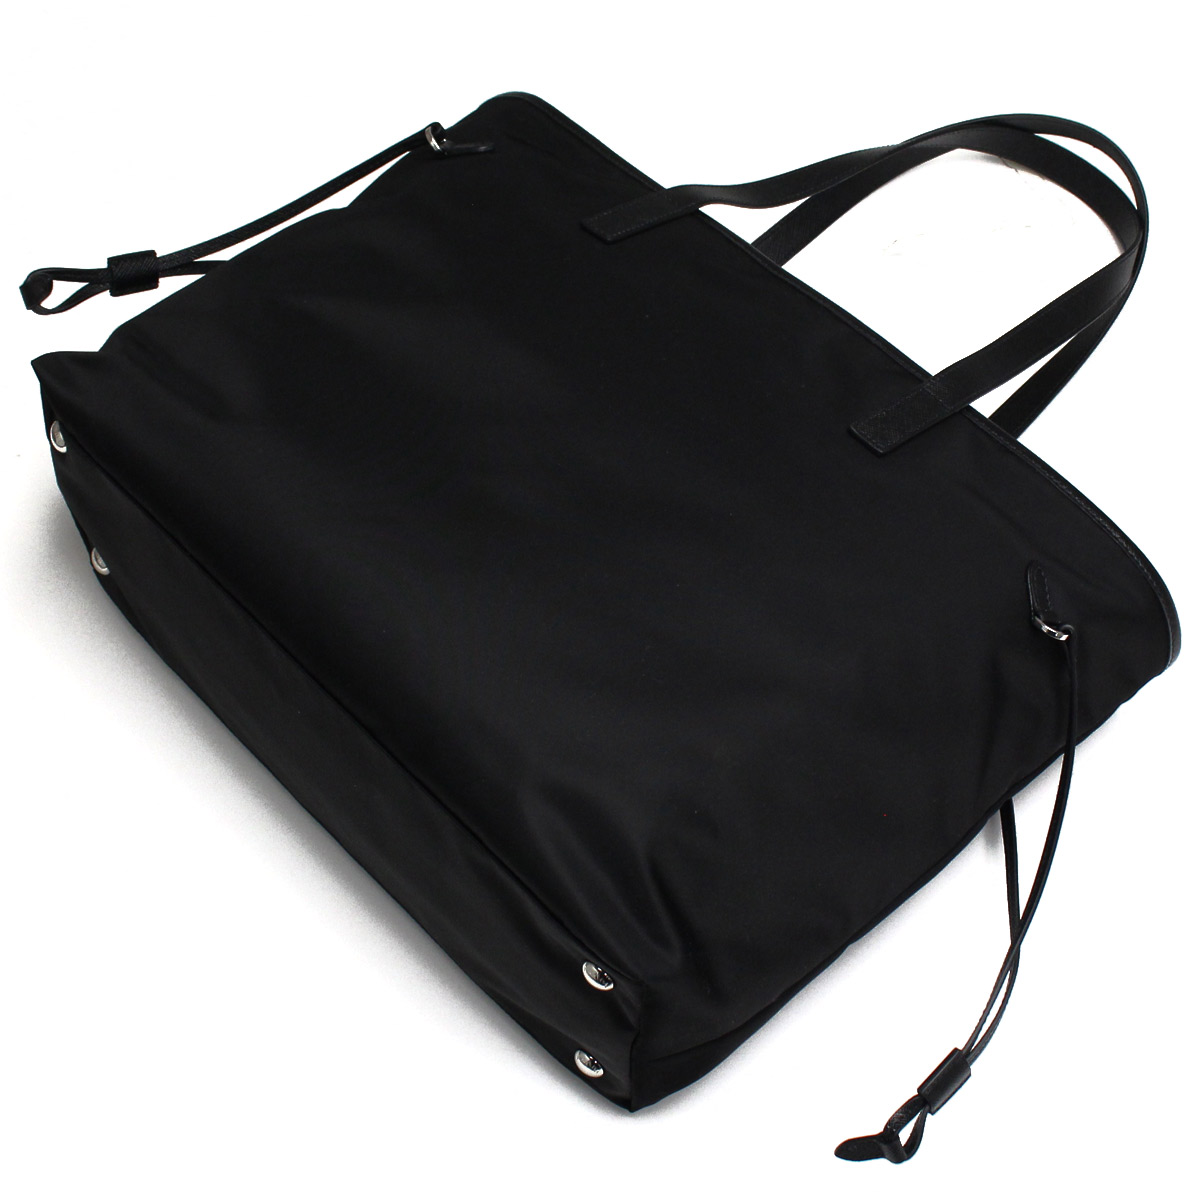 b269bdbdc2e Bighit The total brand wholesale: Prada PRADA bag nylon tote bag ...